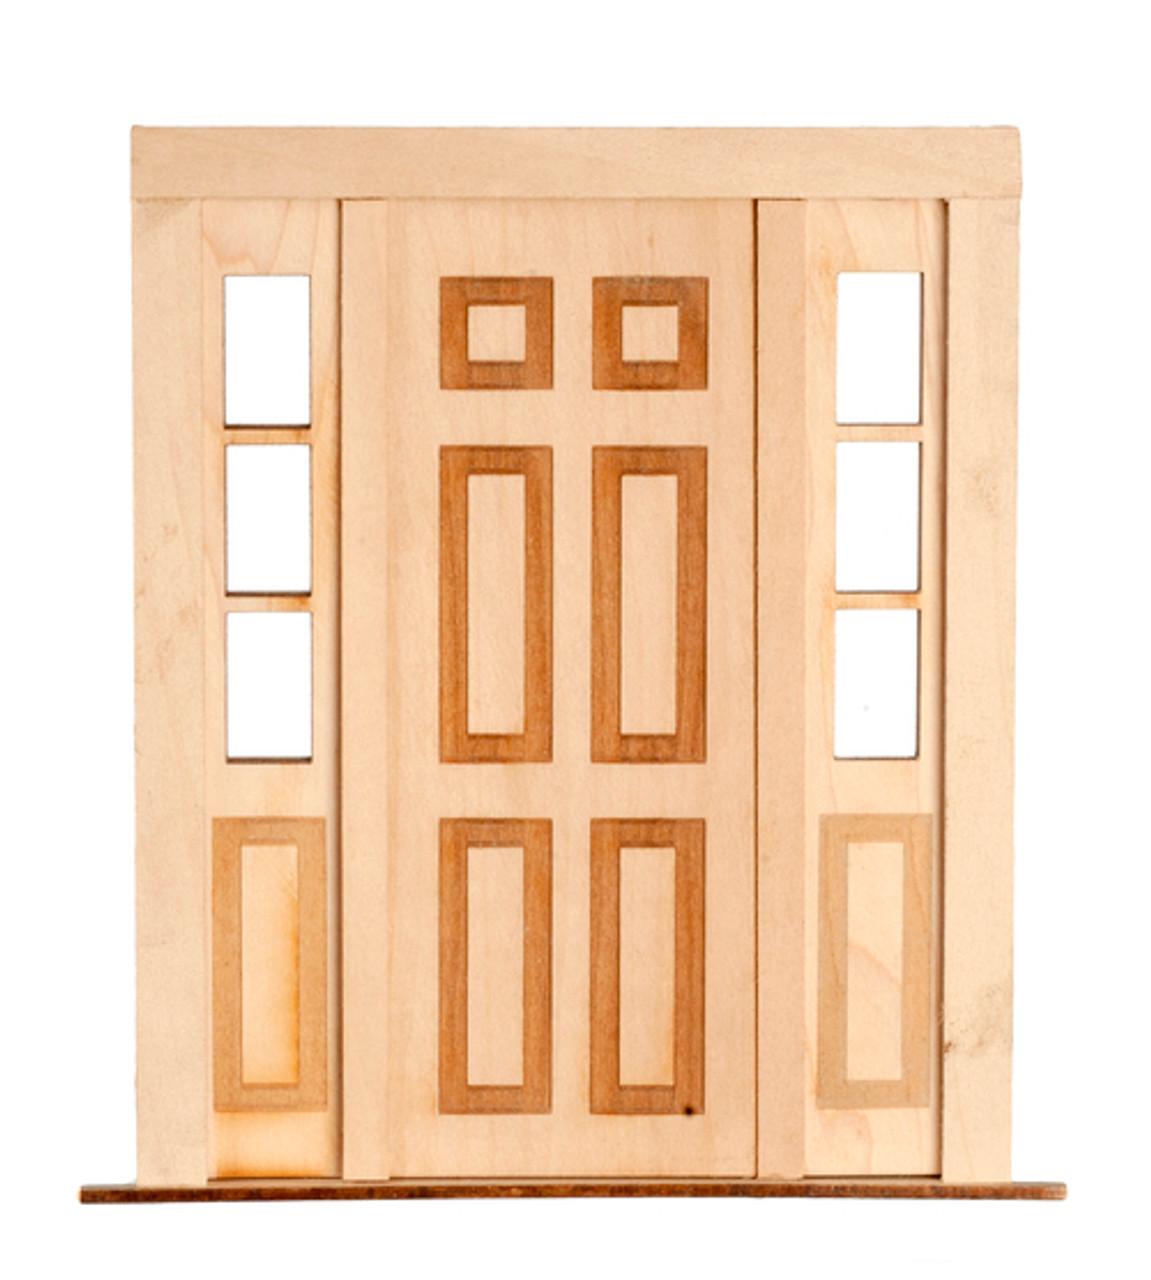 6 Raised Panel Side Light Door